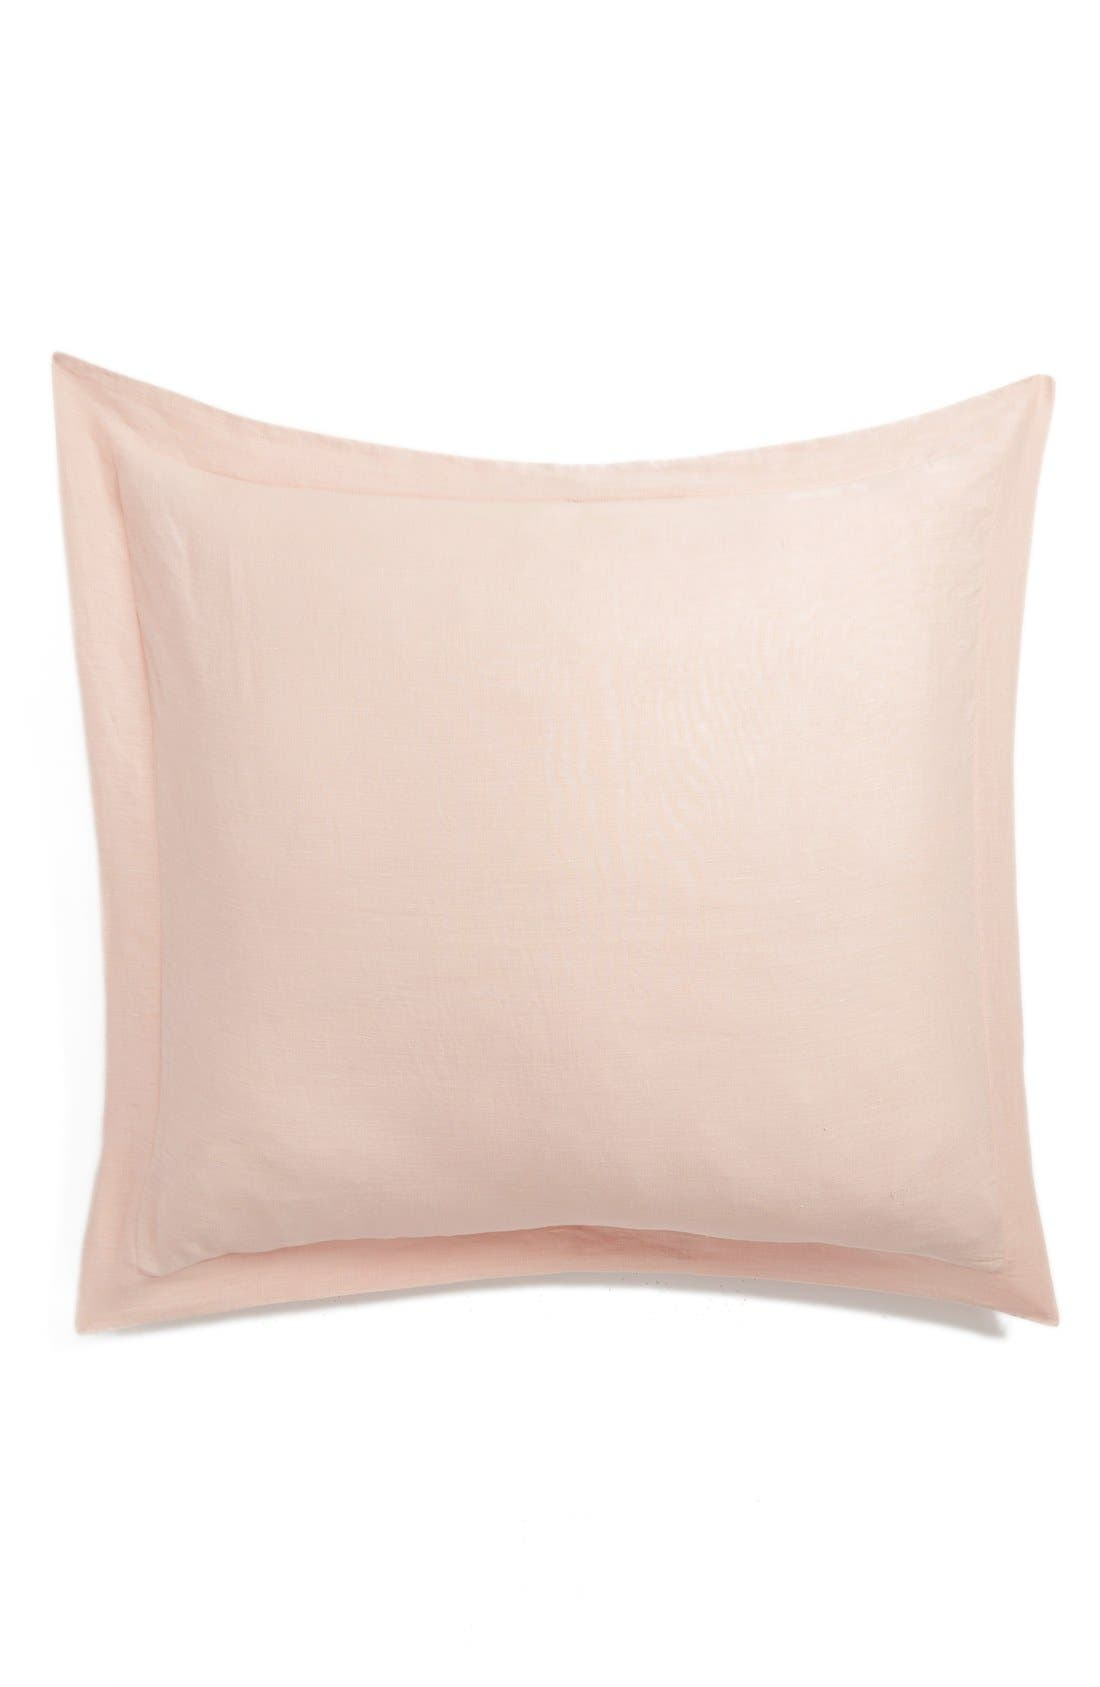 Washed Linen Euro Sham,                         Main,                         color, Blush